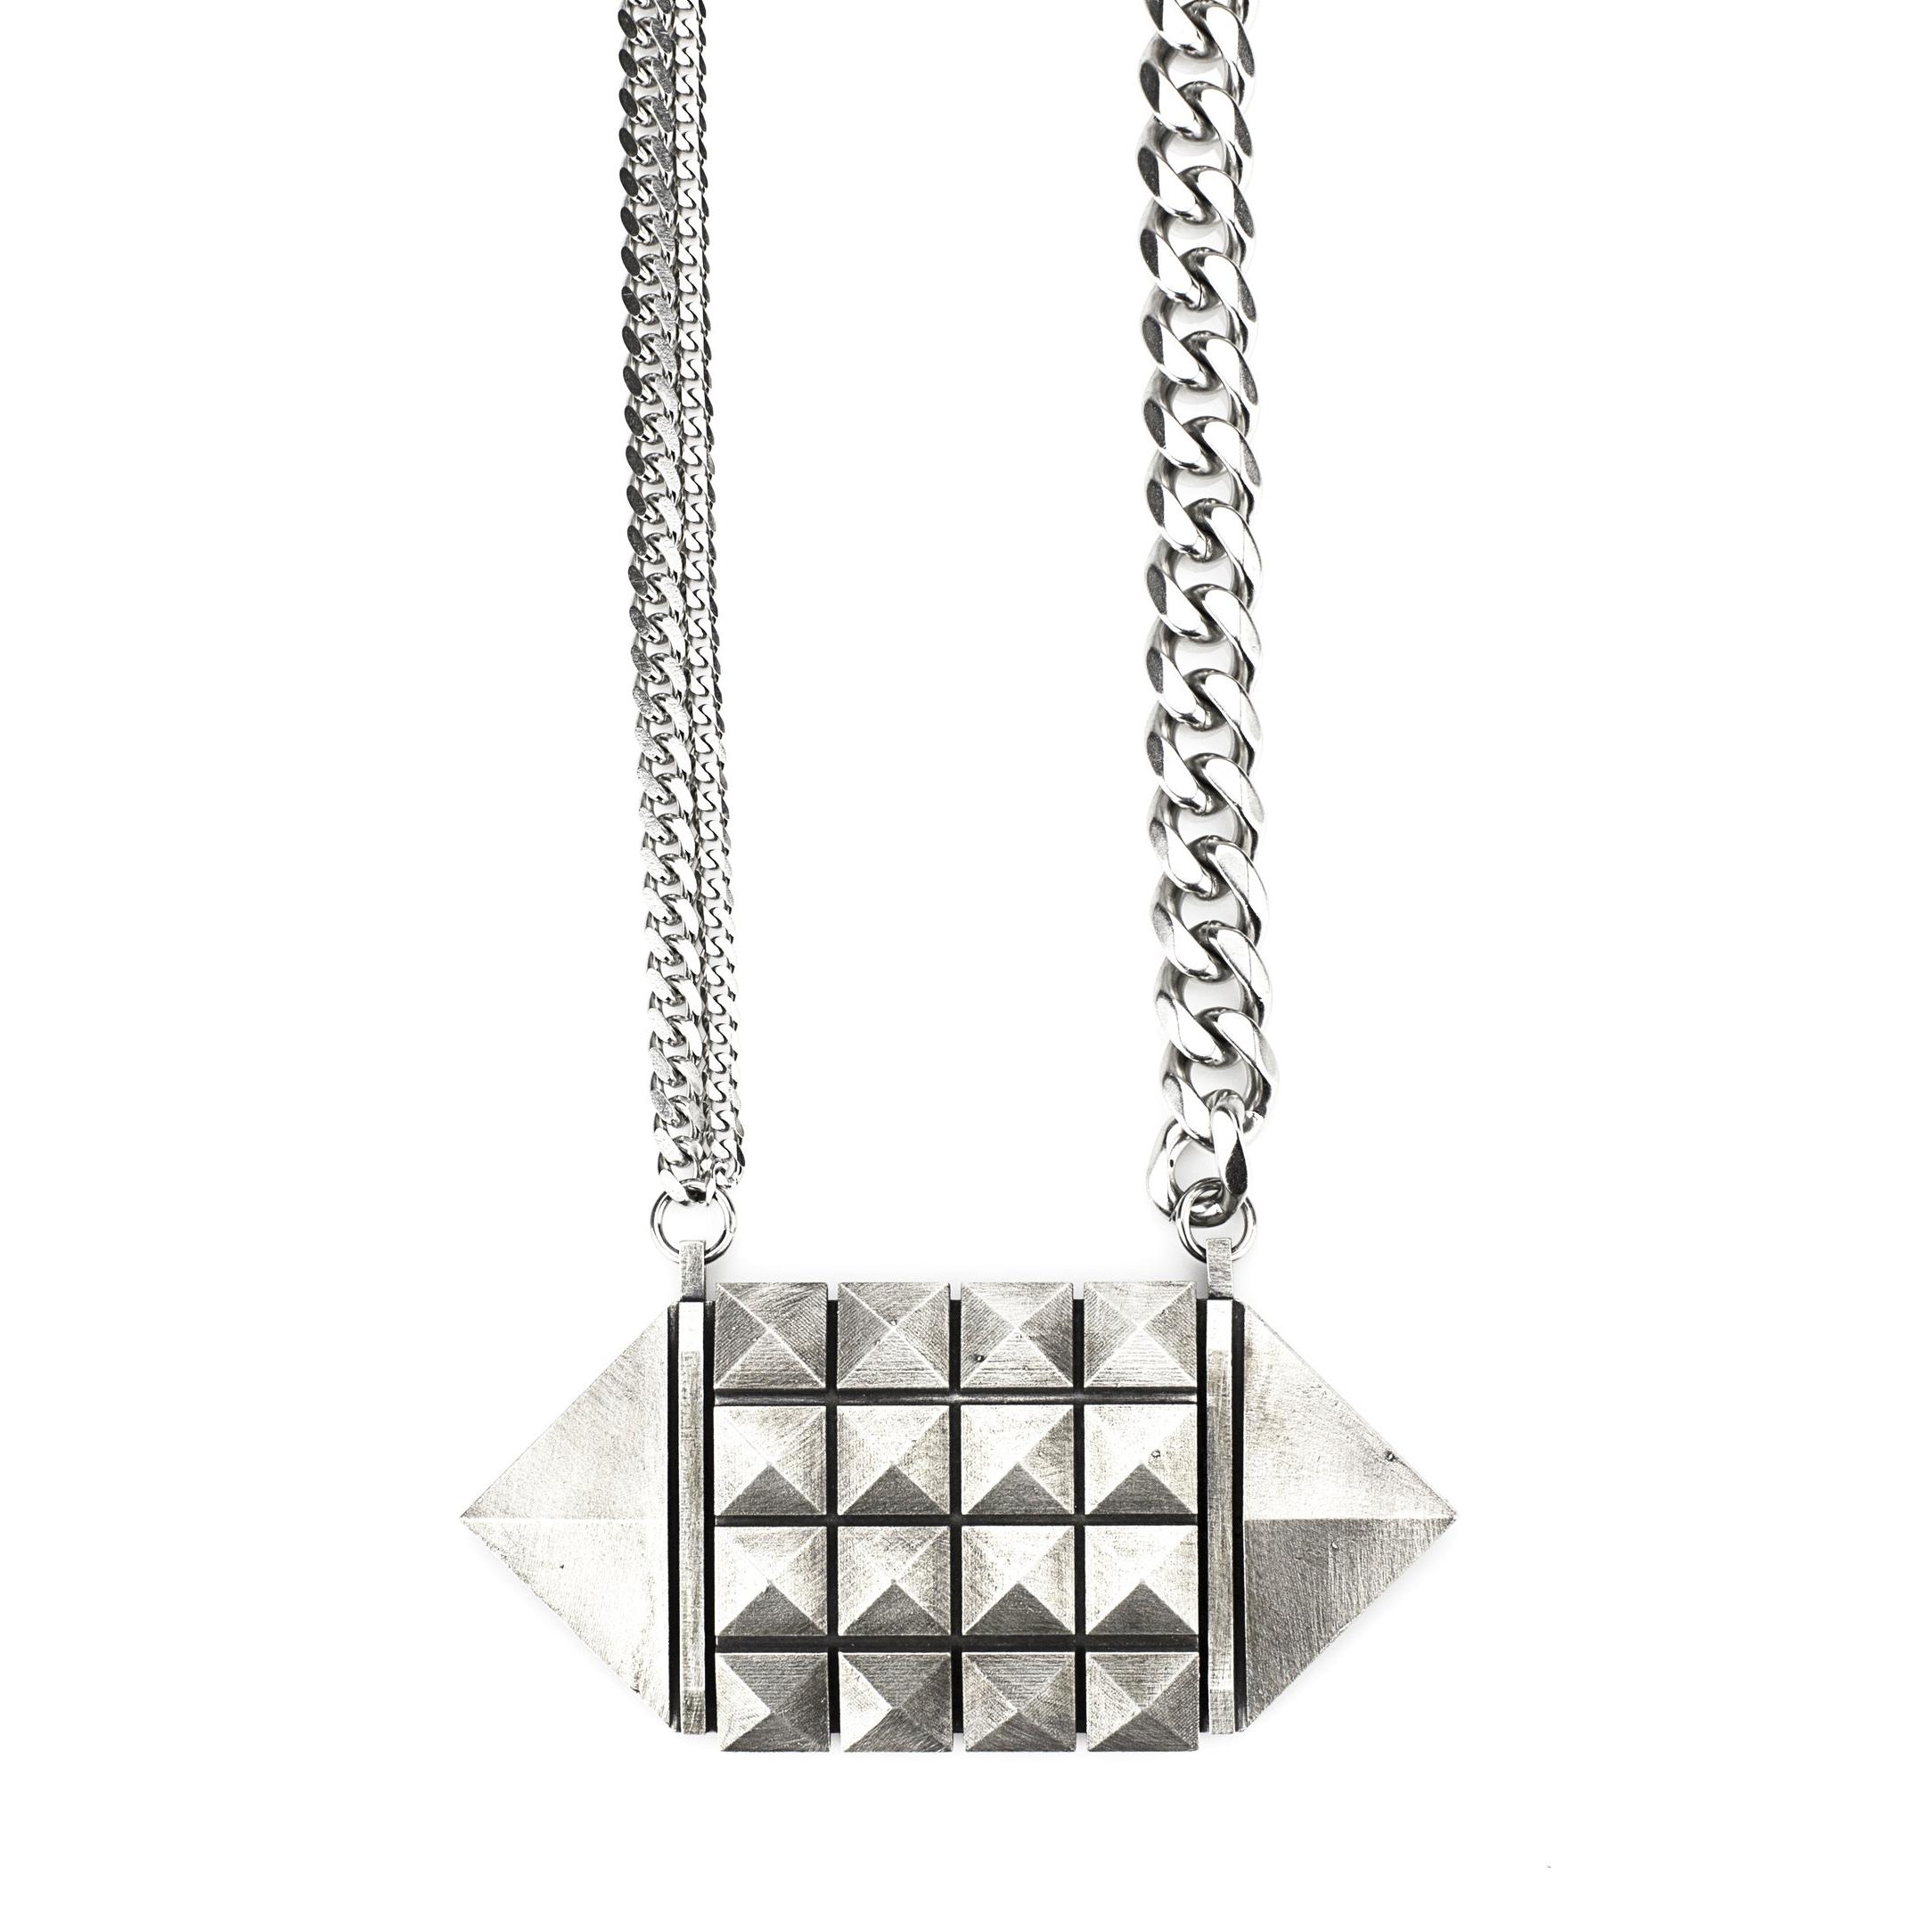 Necklace16X-01-EDIT.jpg